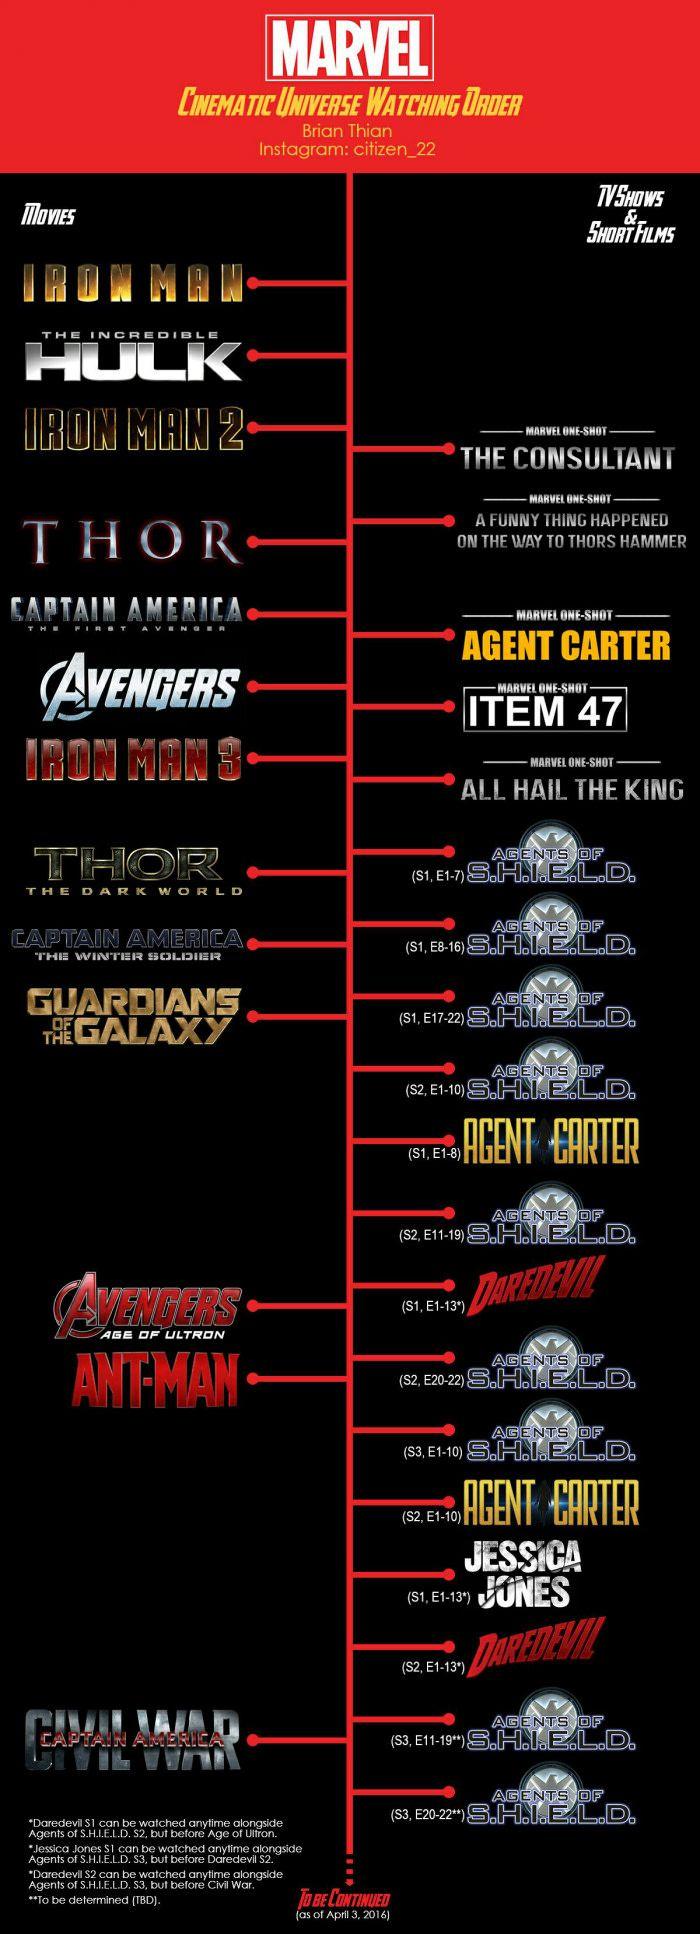 MCU, Marvel Cinematic Universe watching order